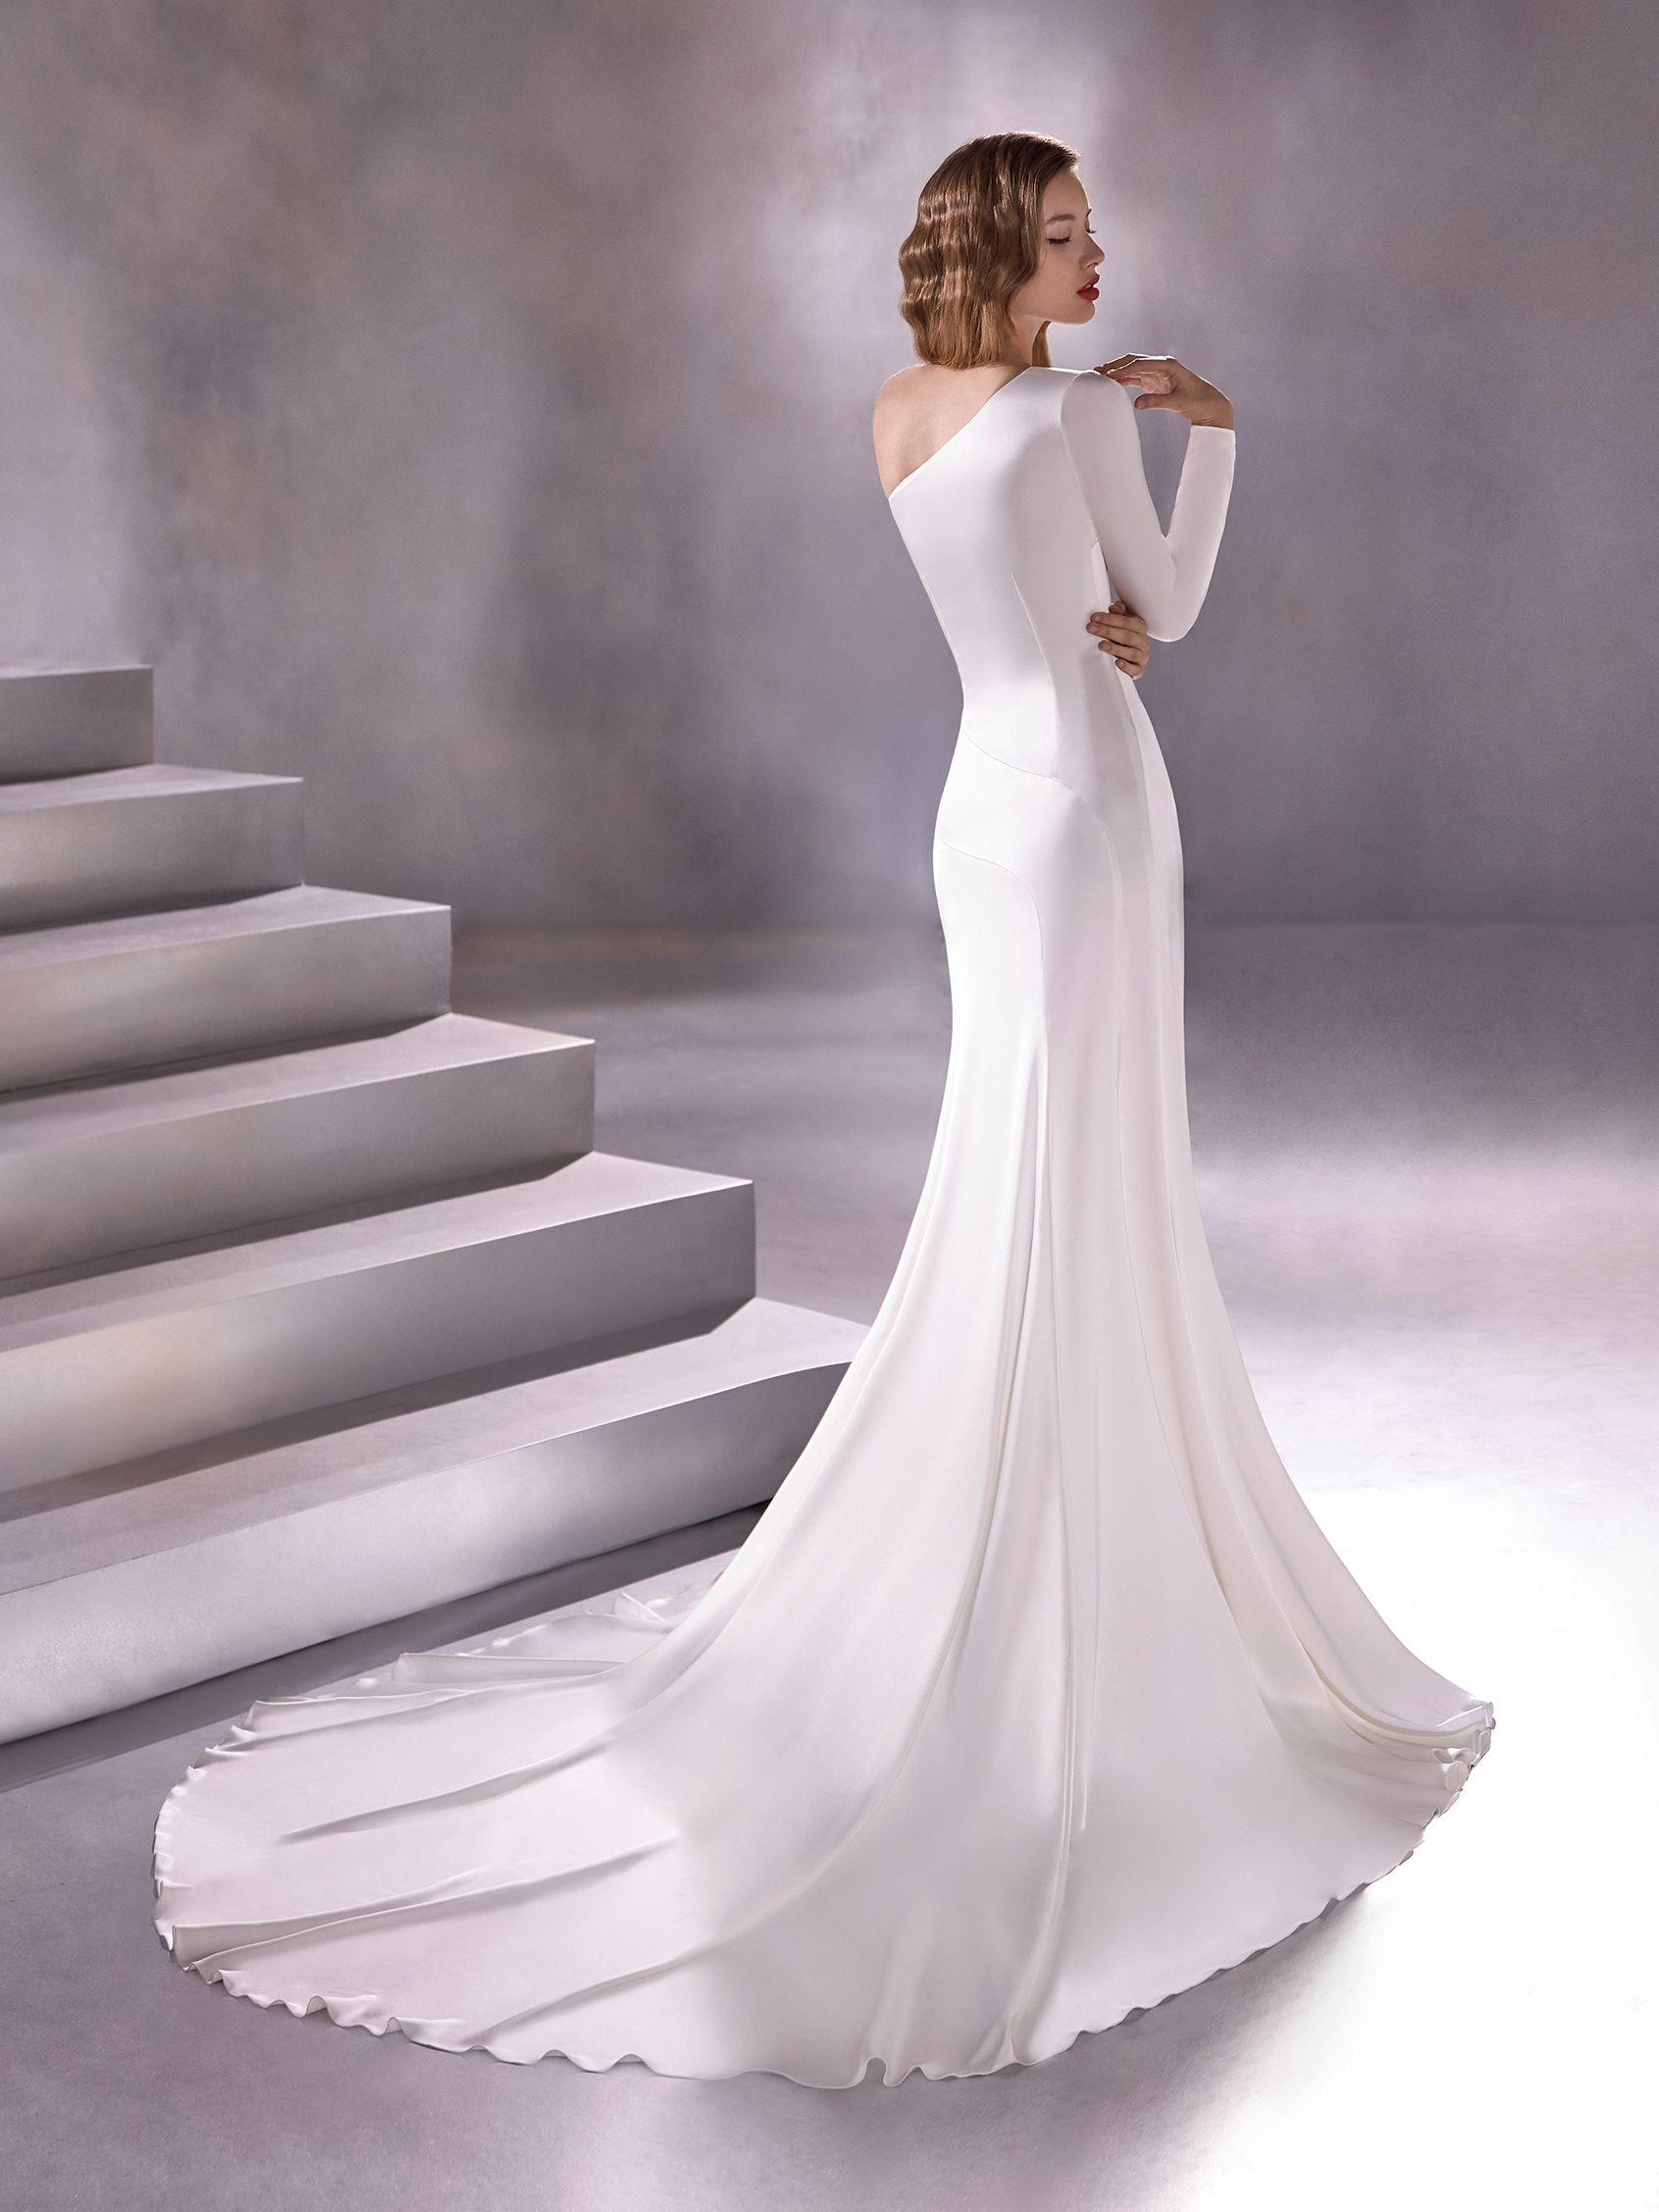 Sundrop Wedding Dresses Dresses Stunning Wedding Dresses [ 2255 x 1691 Pixel ]